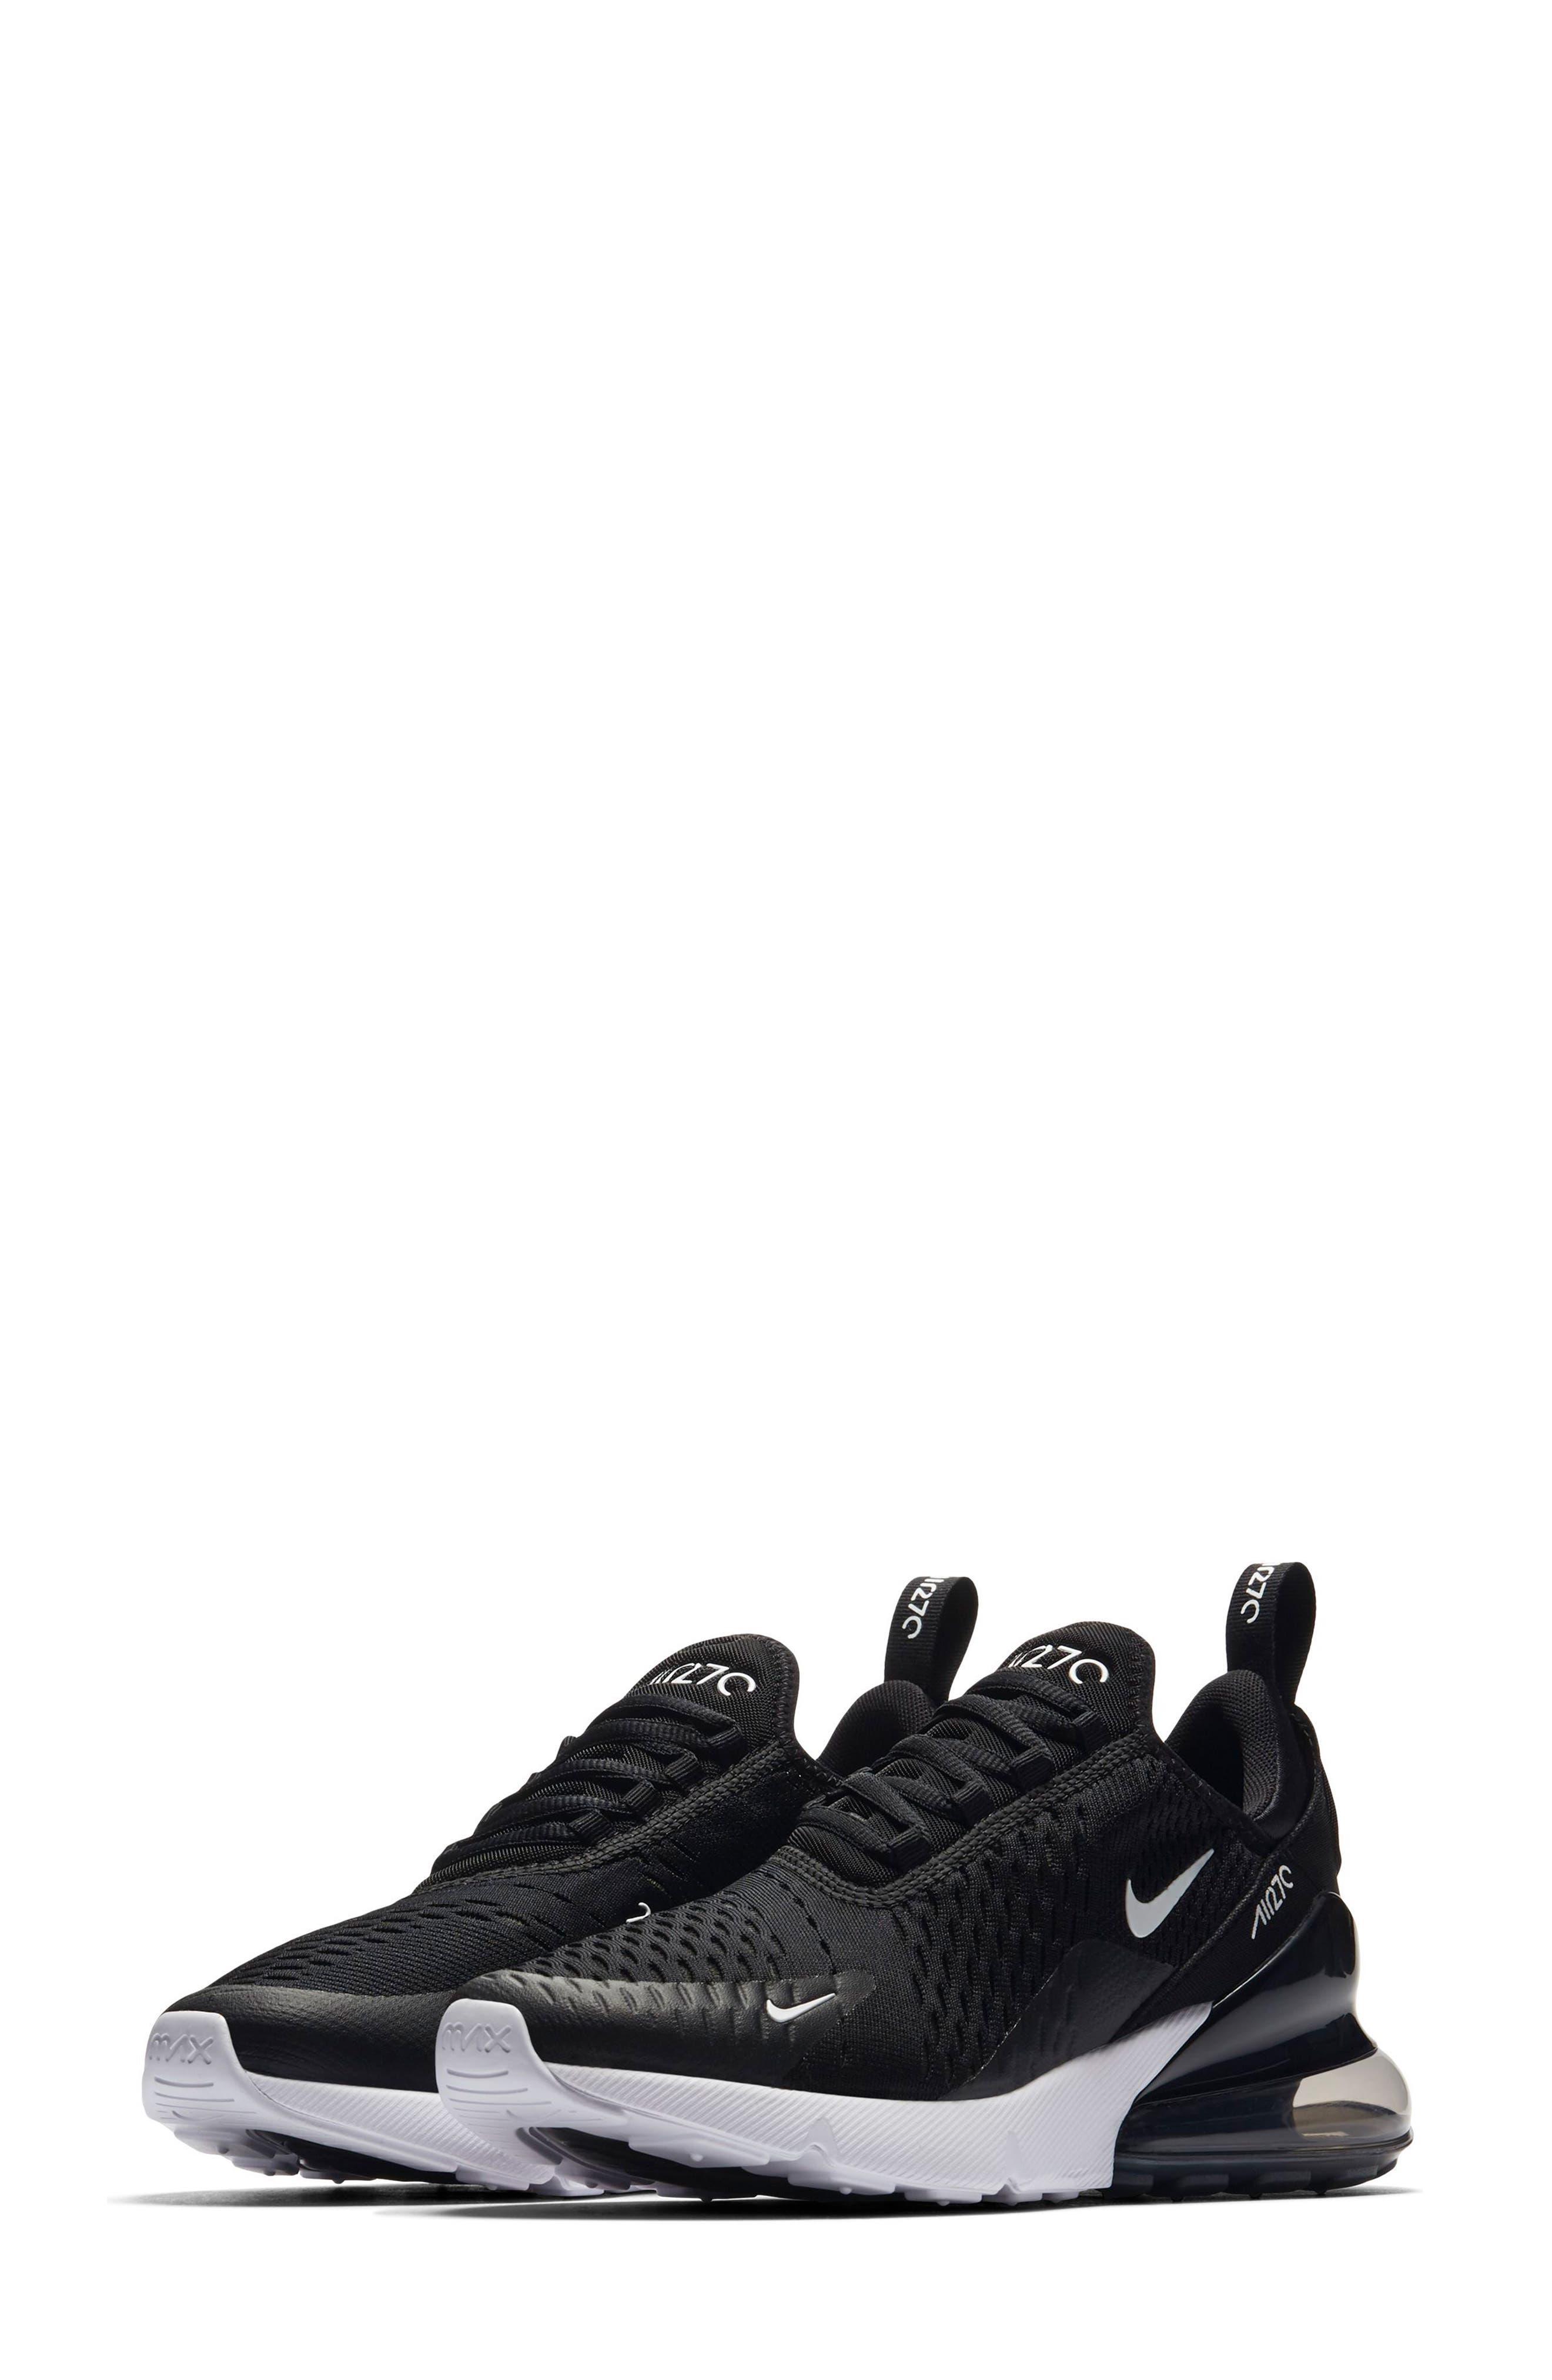 Air Max 270 Sneaker,                             Main thumbnail 1, color,                             Black/ Anthracite/ White